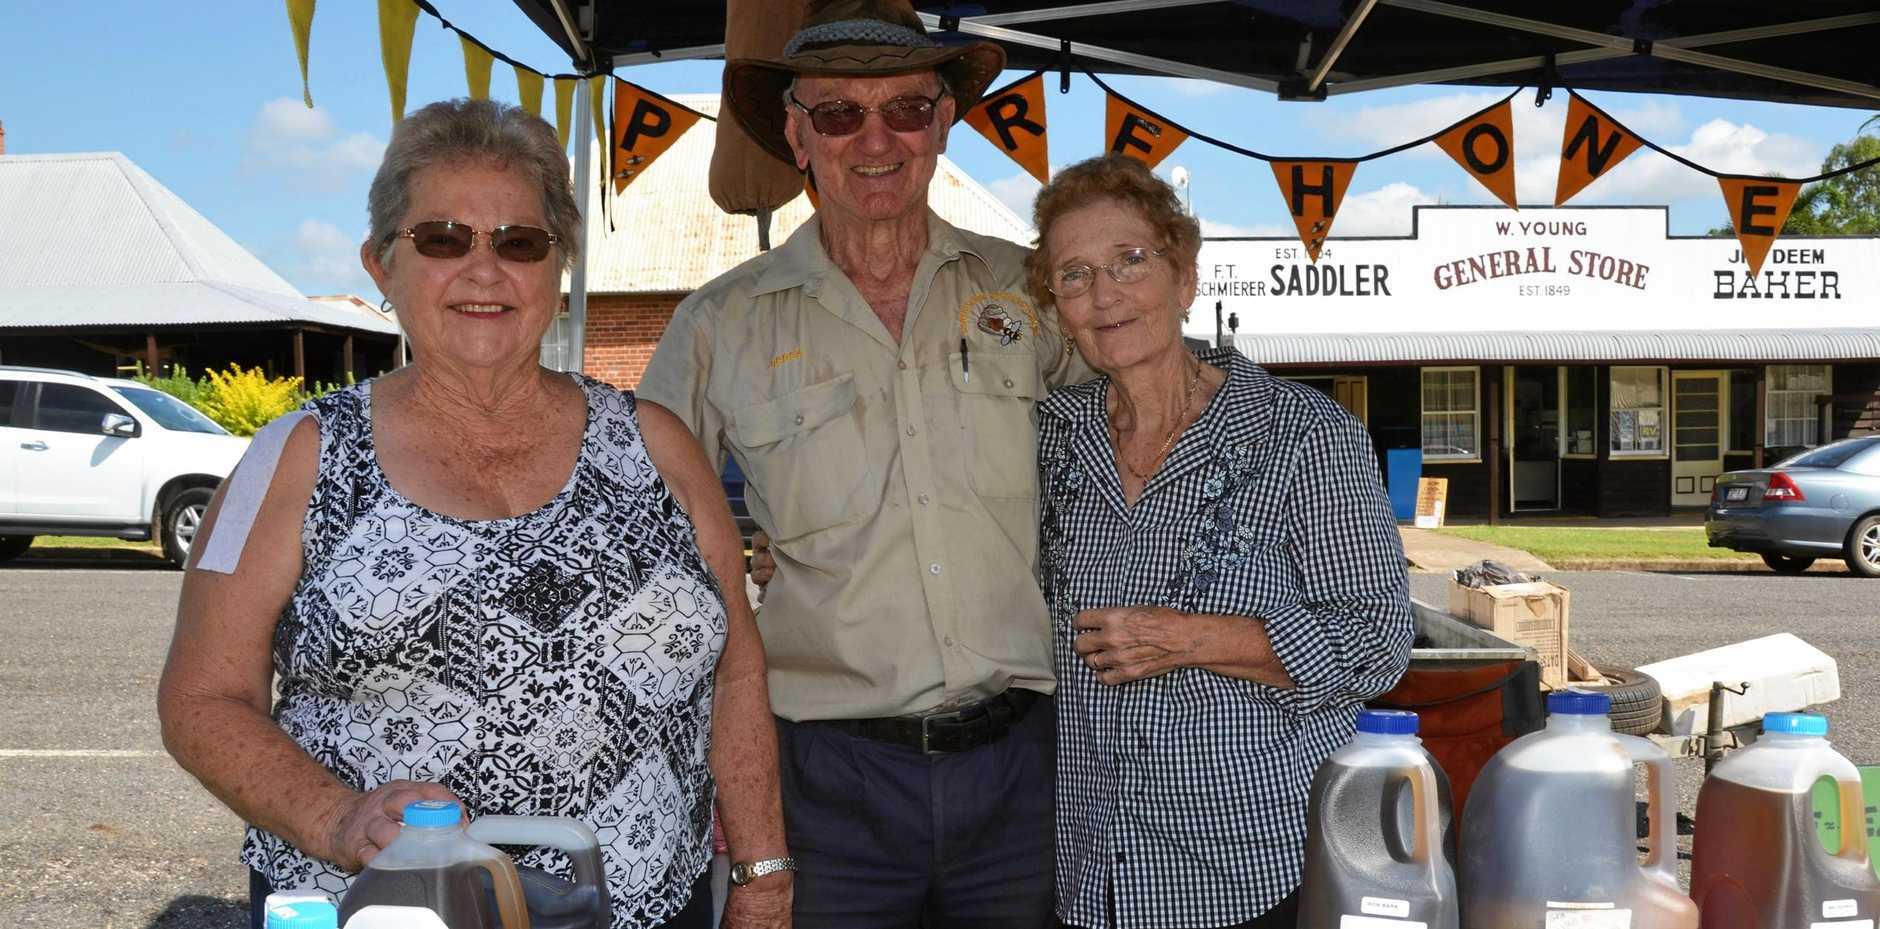 MARKETS: Beryl Palmer, Yvonne Godbold, and Derek R Jones talking all things honey.